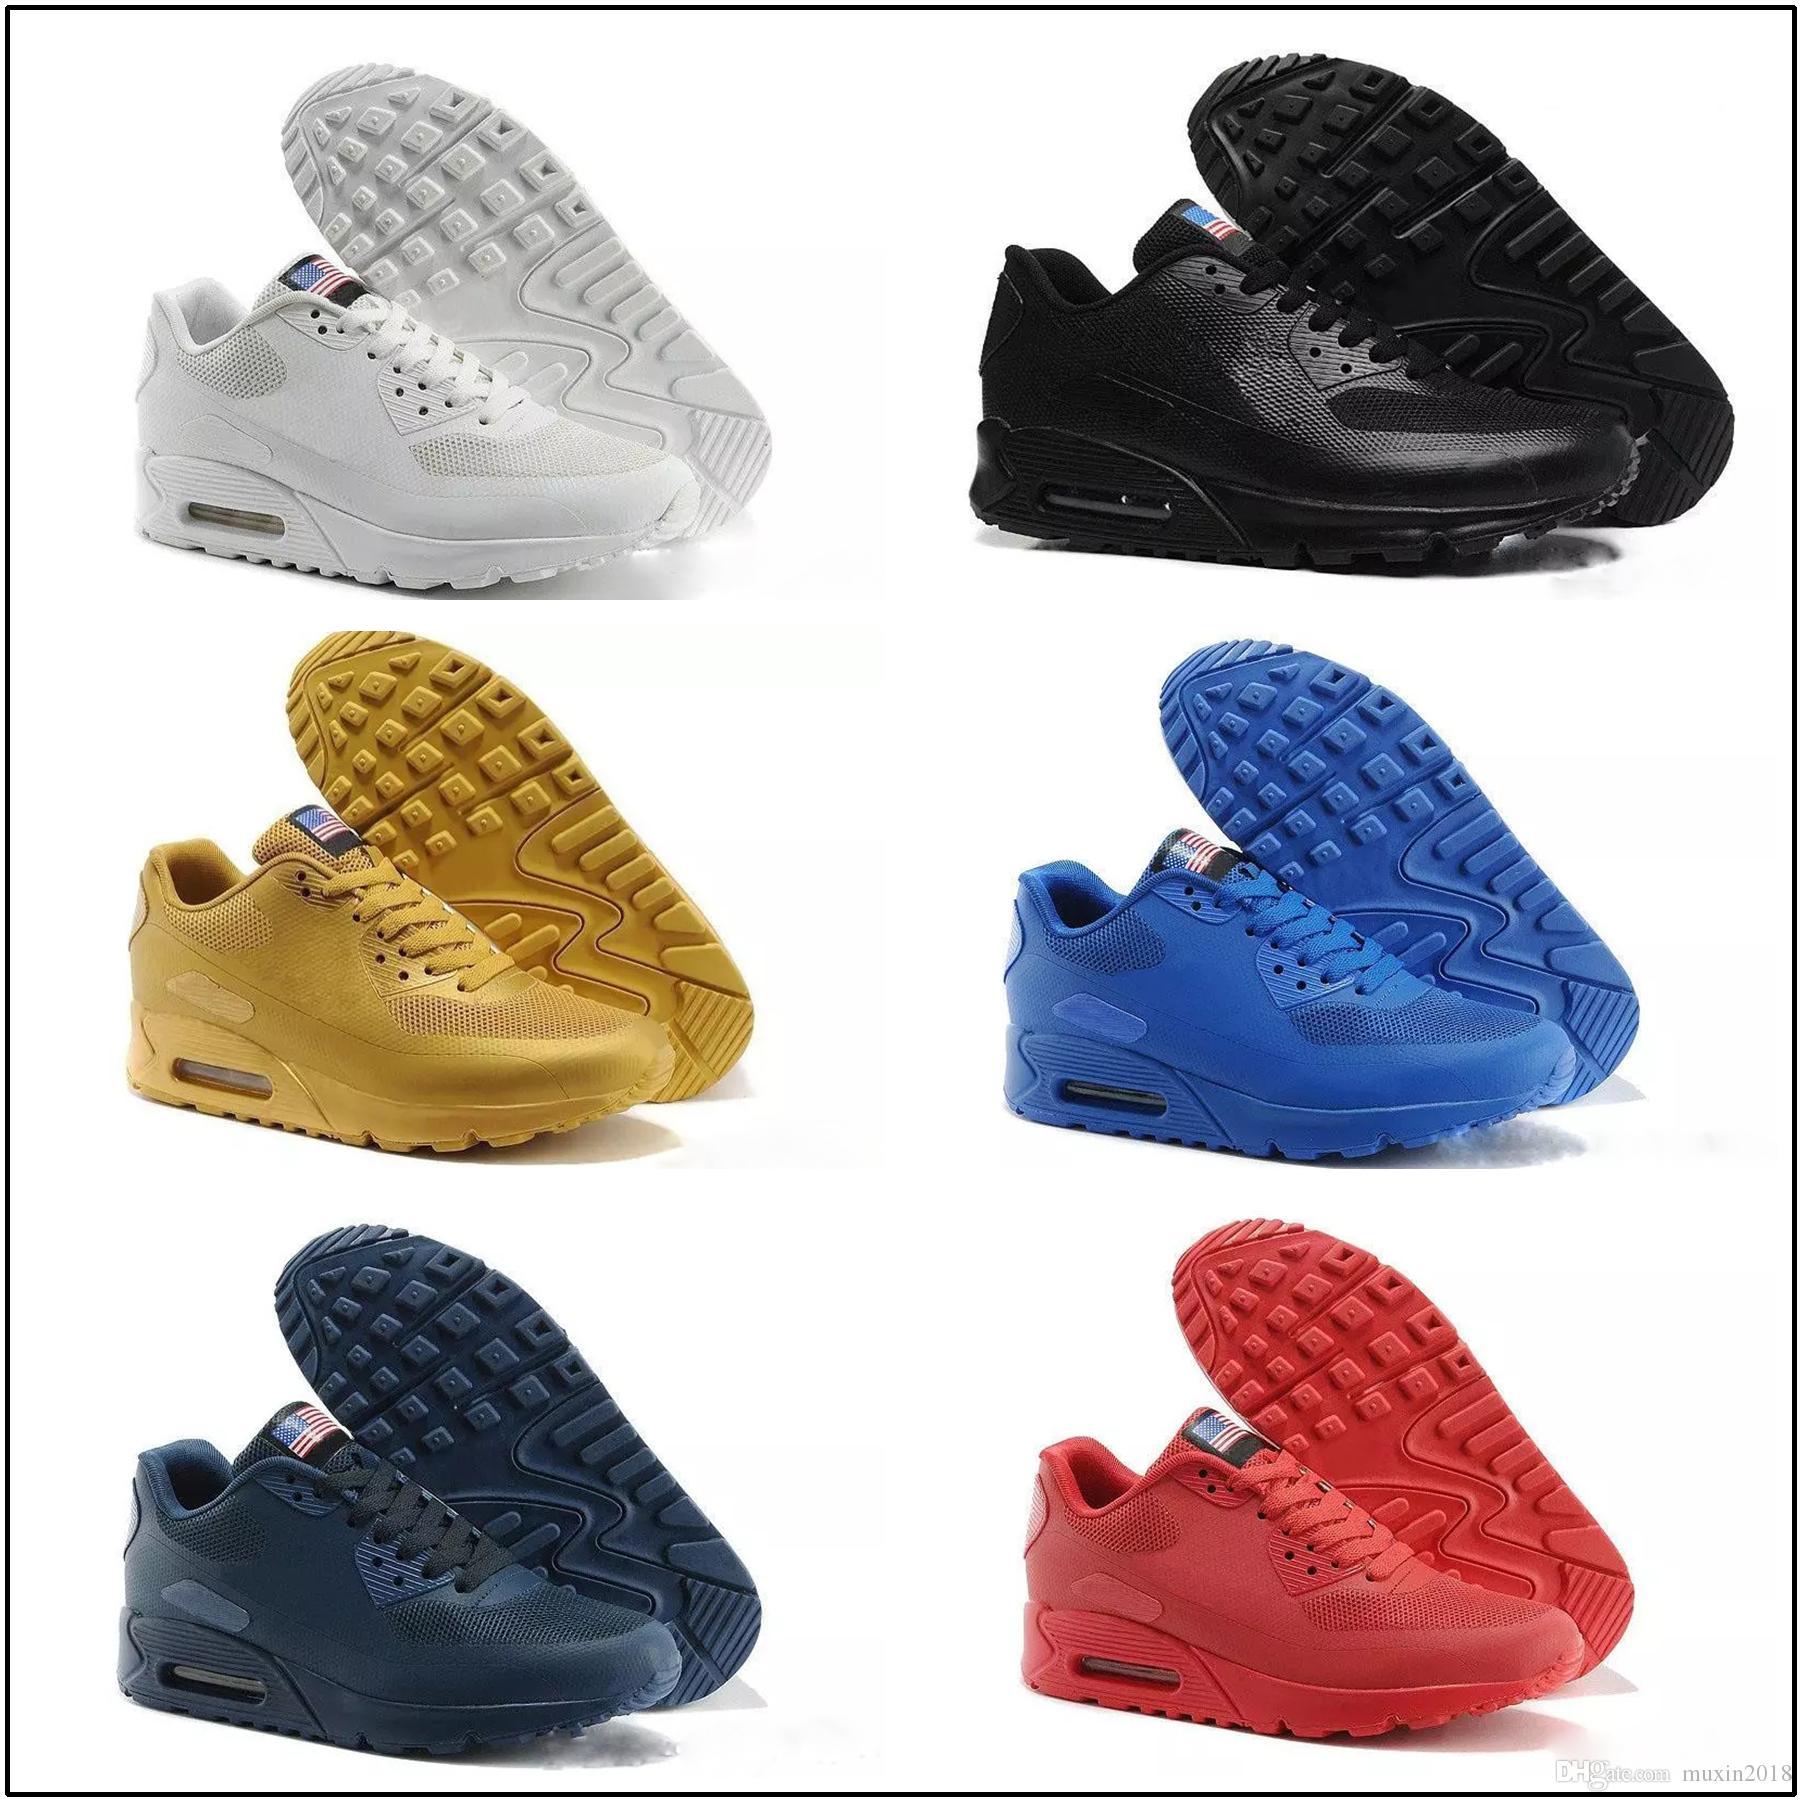 pick up 69d46 c0860 Compre Nike Air Max 90 HYP PRM QS Zapatillas Deportivas Alr 90 HYP PRM QS  Hombre Mujer Alr 90s Bandera Americana Negro Blanco Azul Marino Oro Plata X  A M ...